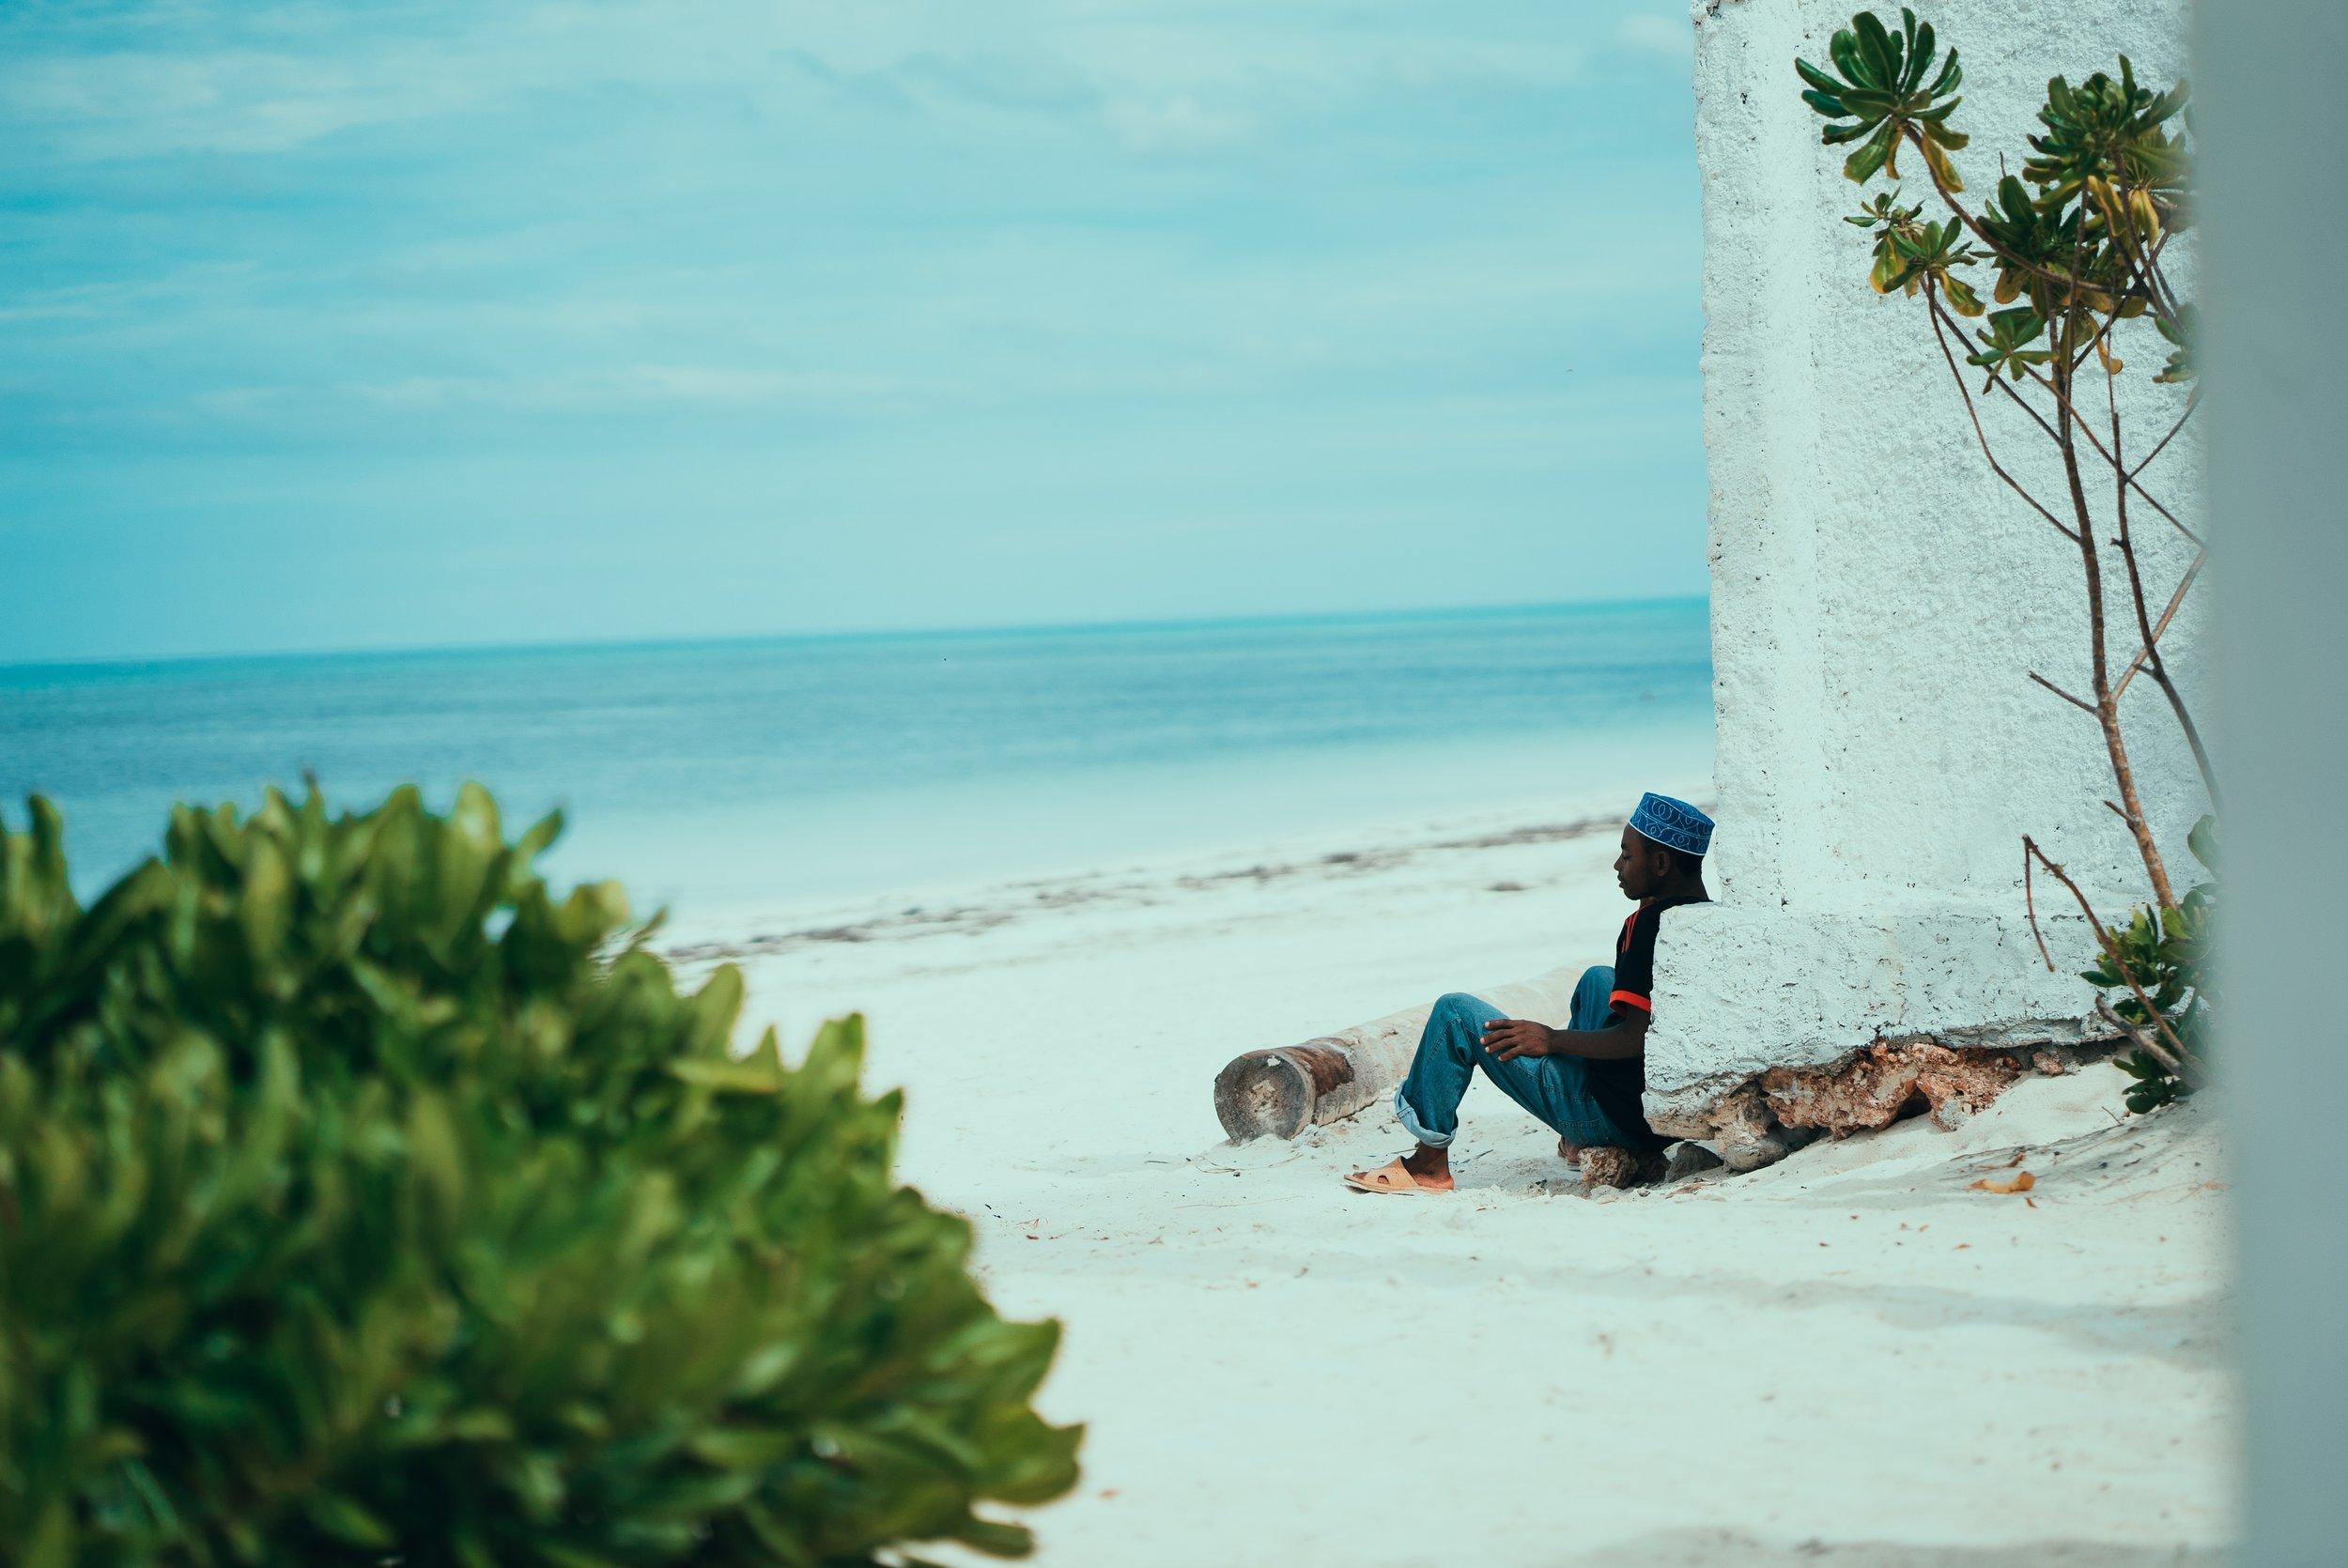 Zanzibar-1660434-unsplash.jpg